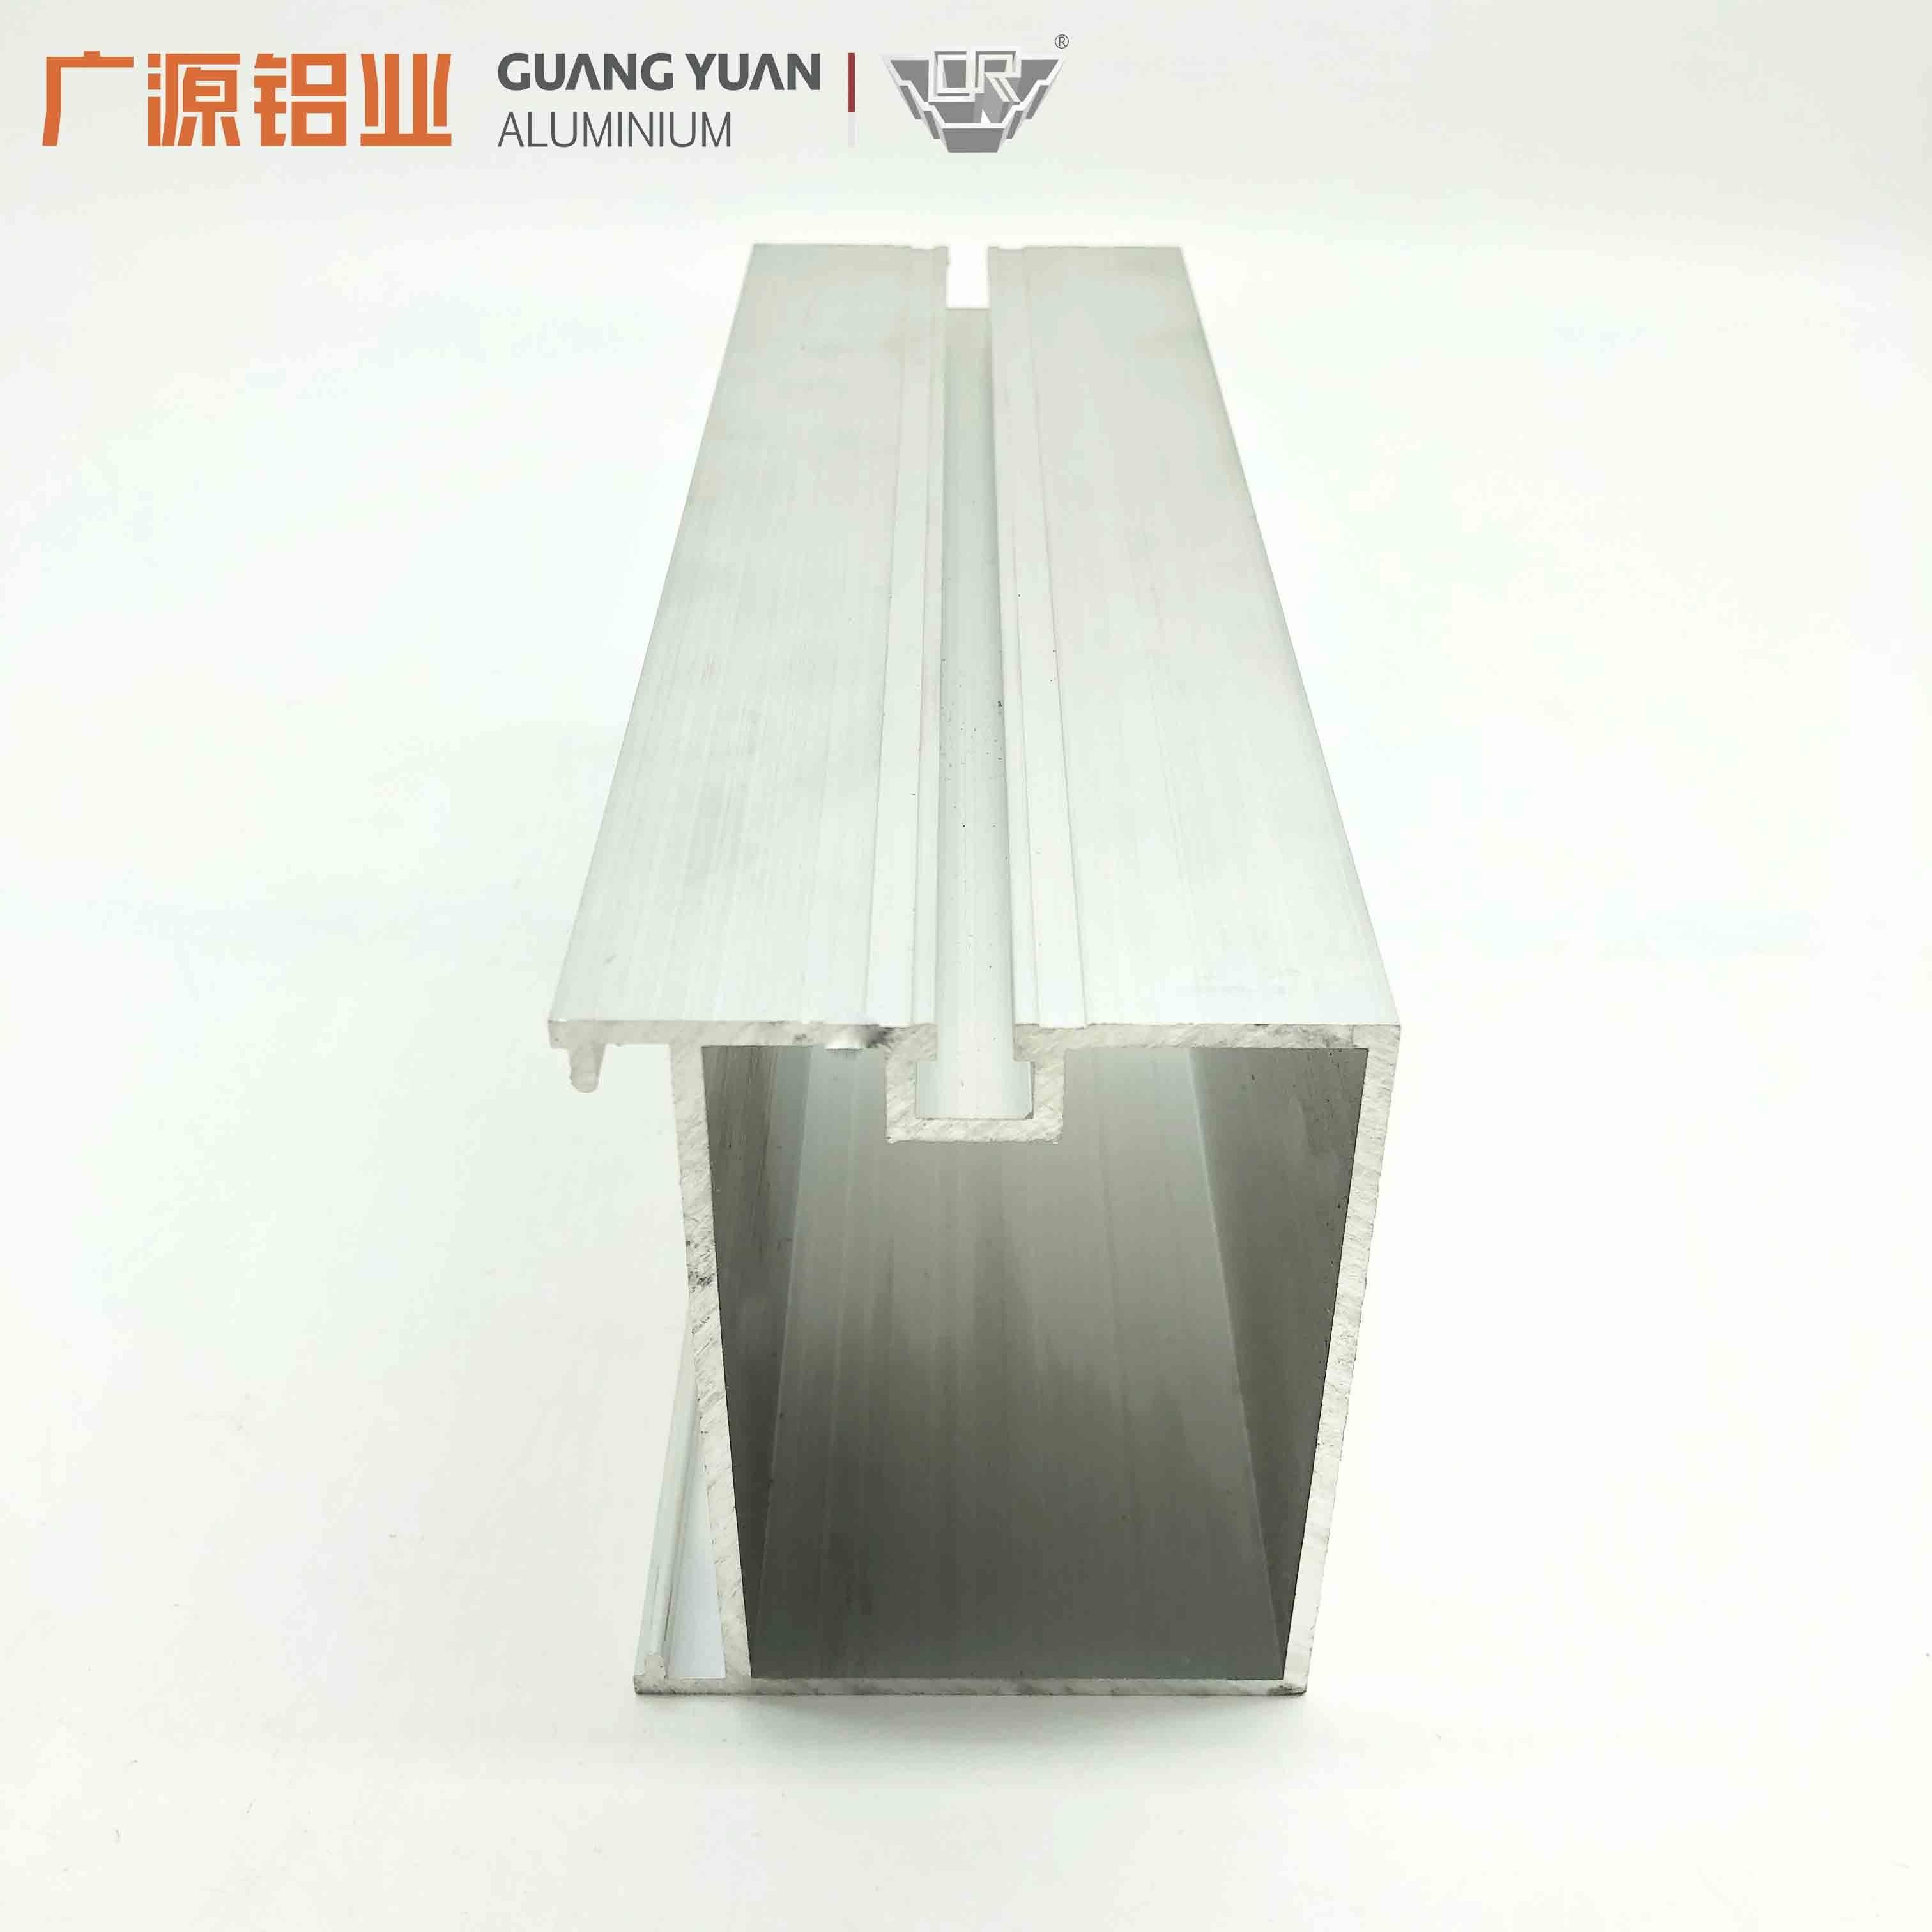 Architectural construction aluminium profile